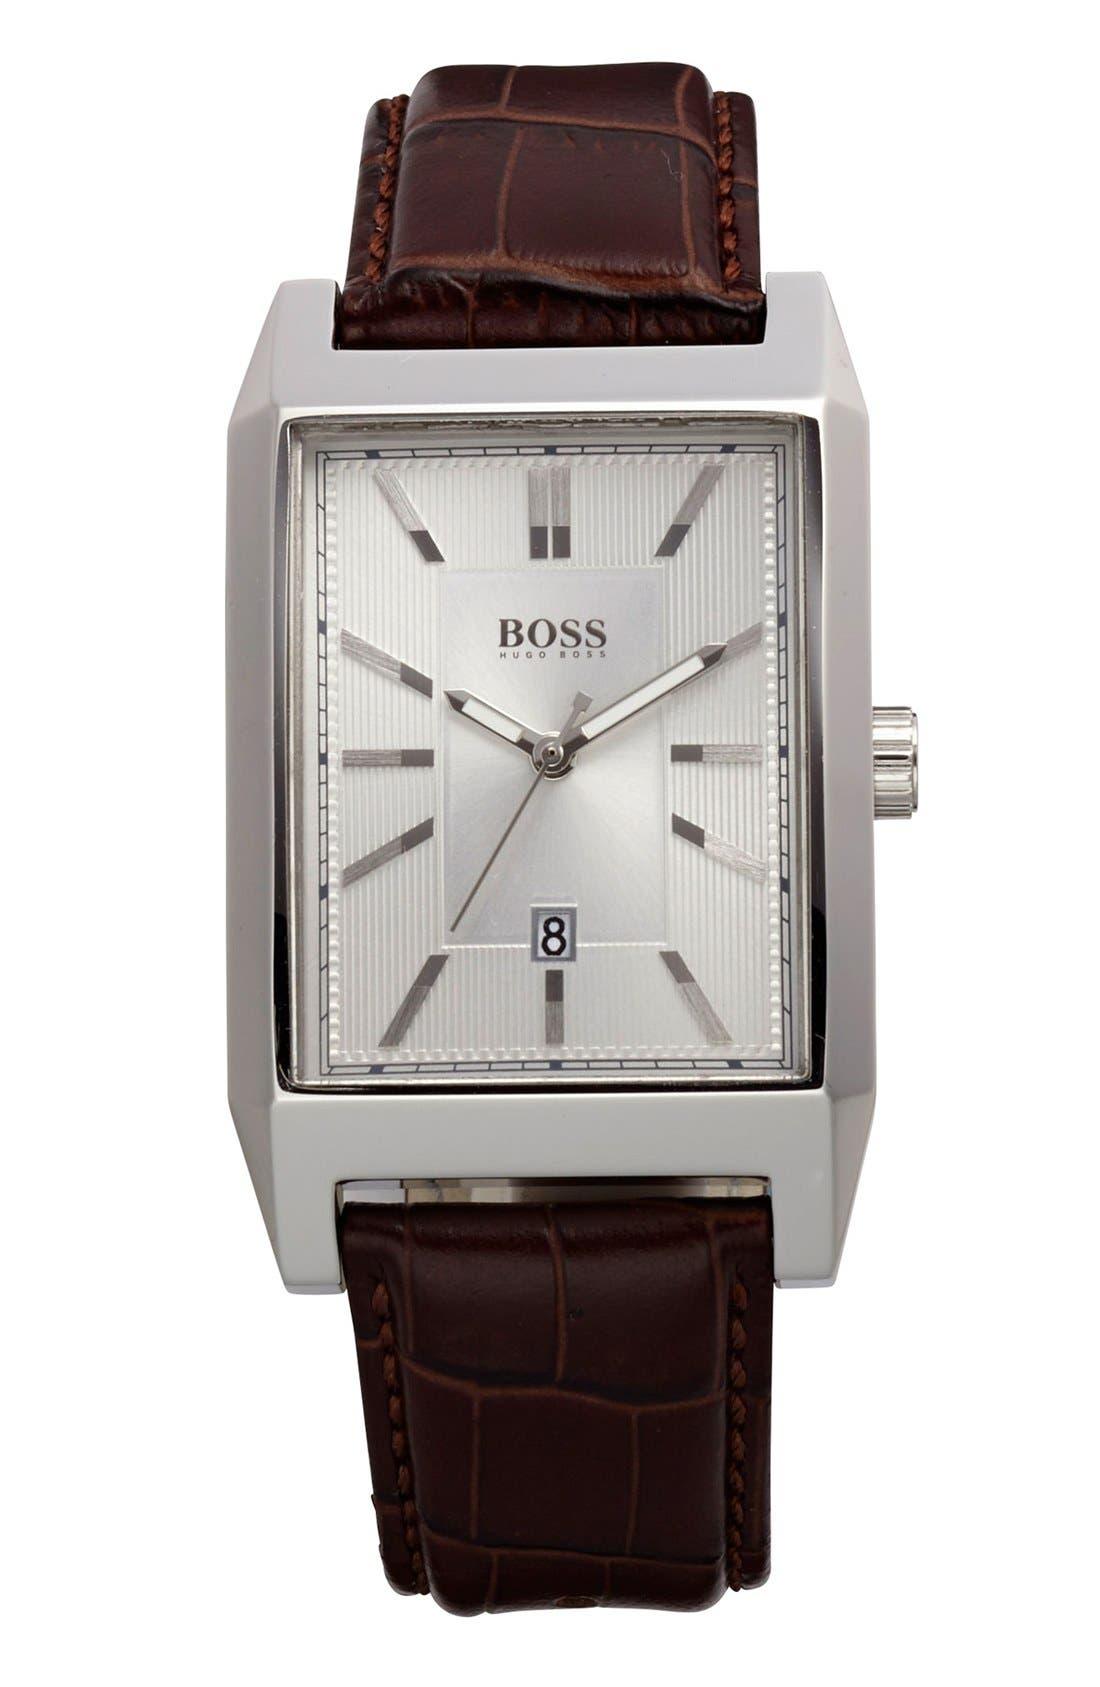 Main Image - BOSS HUGO BOSS Rectangular Leather Strap Watch, 22mm x 33mm